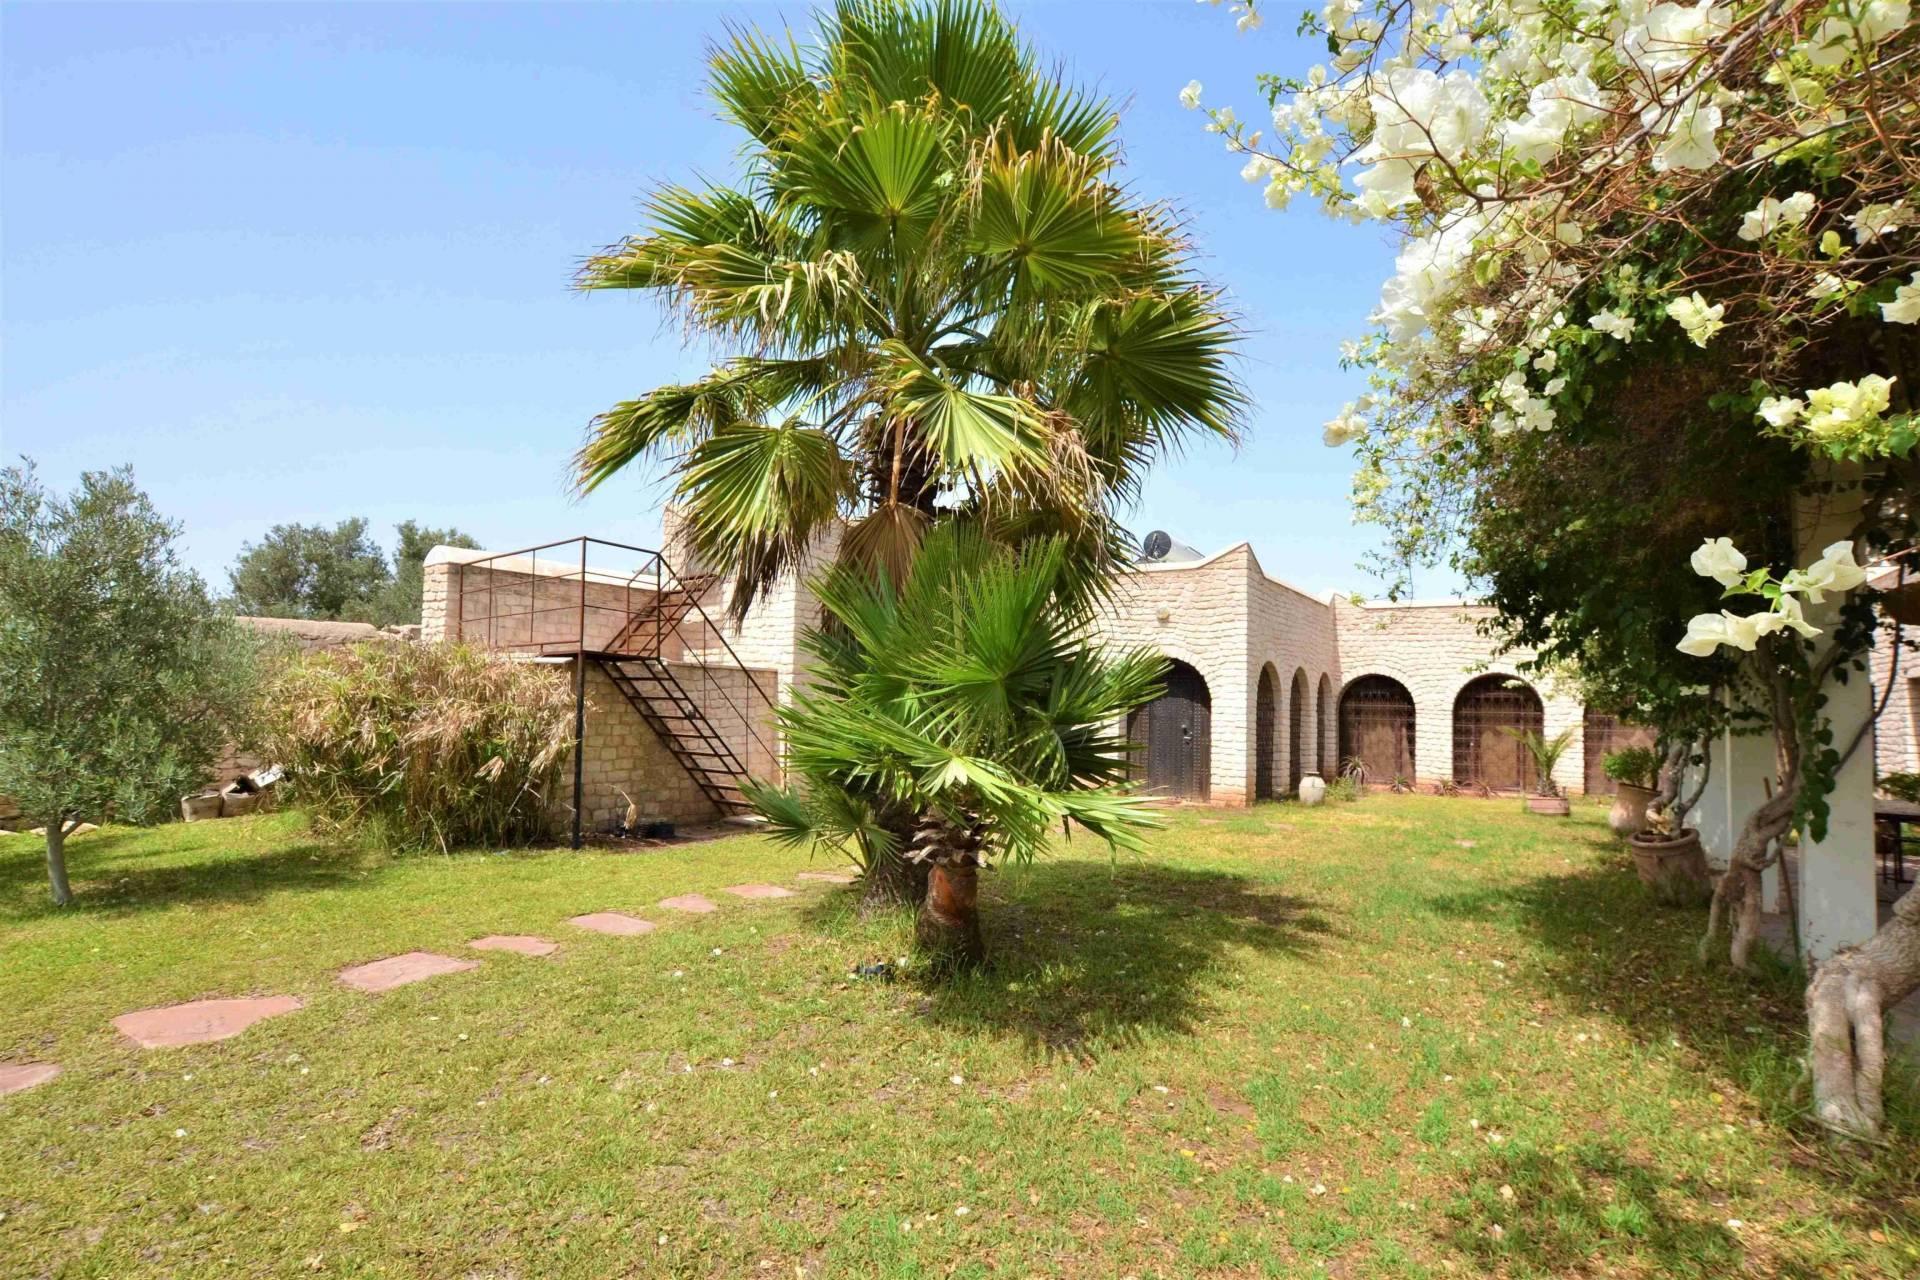 Location - Maison de campagne - 150 m² - Campagne - 550 € - Essaouira - 9251